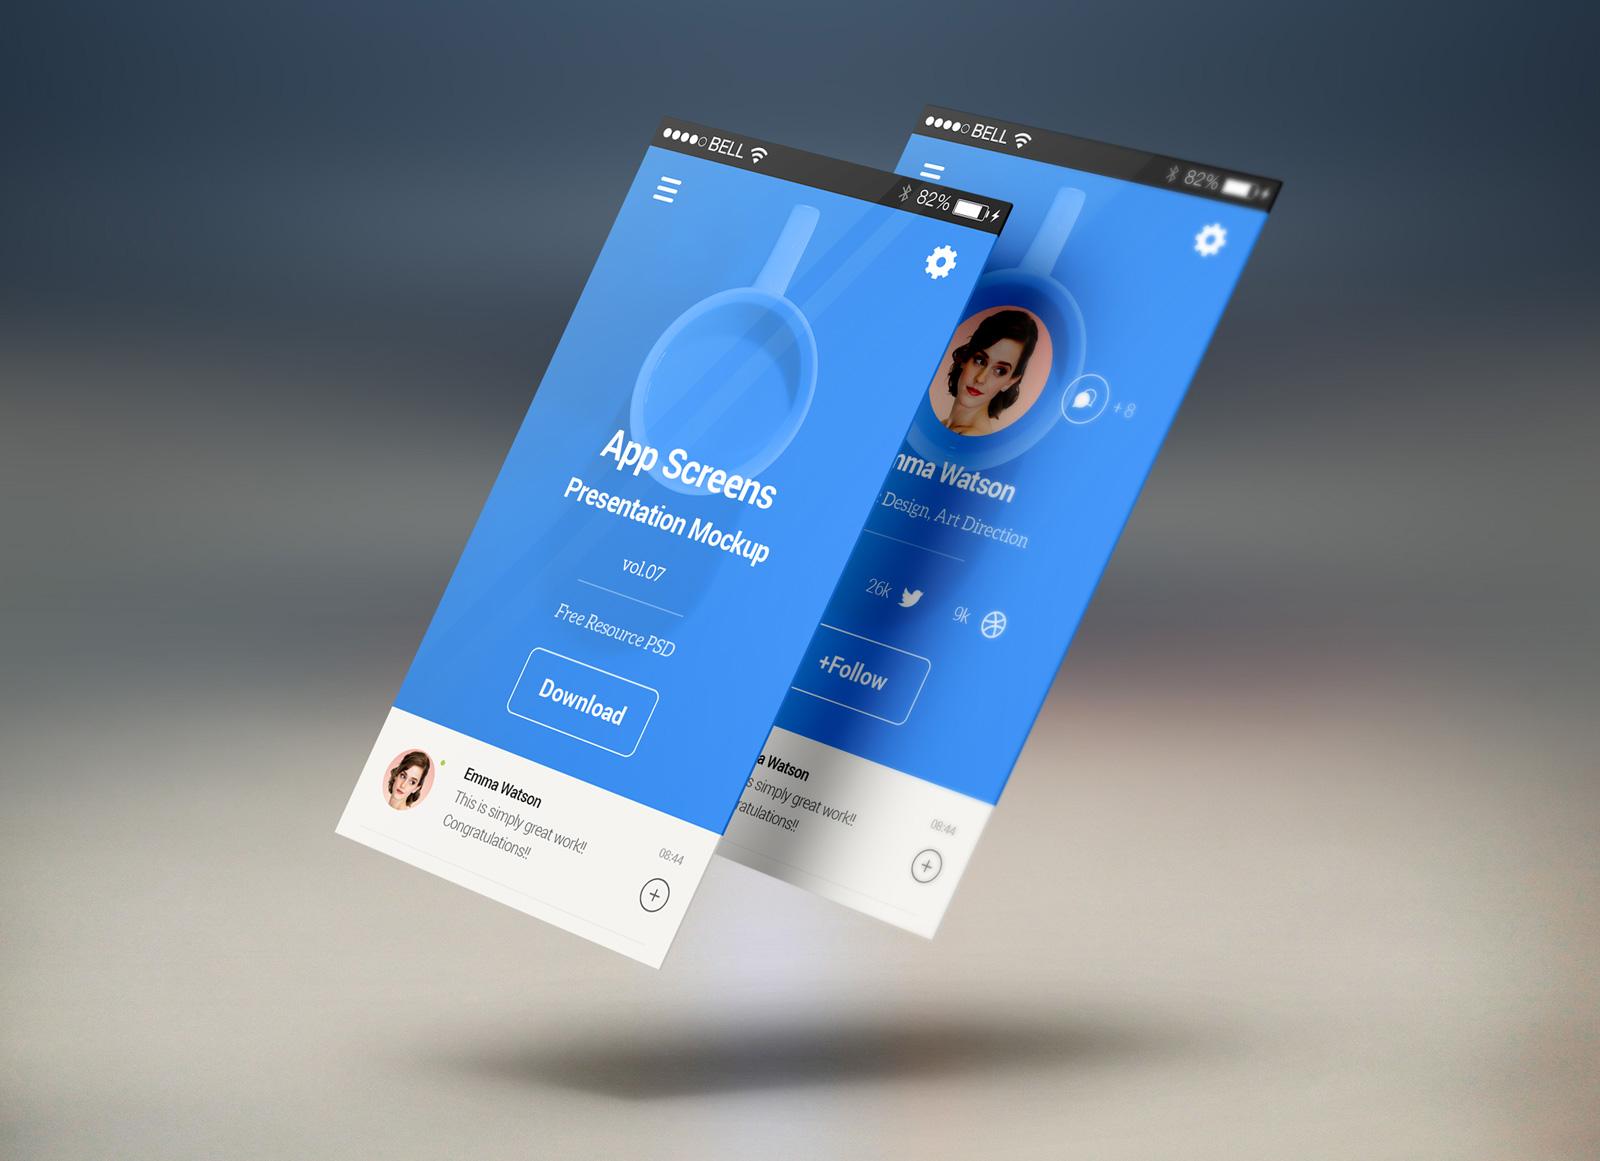 Free Mobile App Screens Presentation Mockup Psd Good Mockups